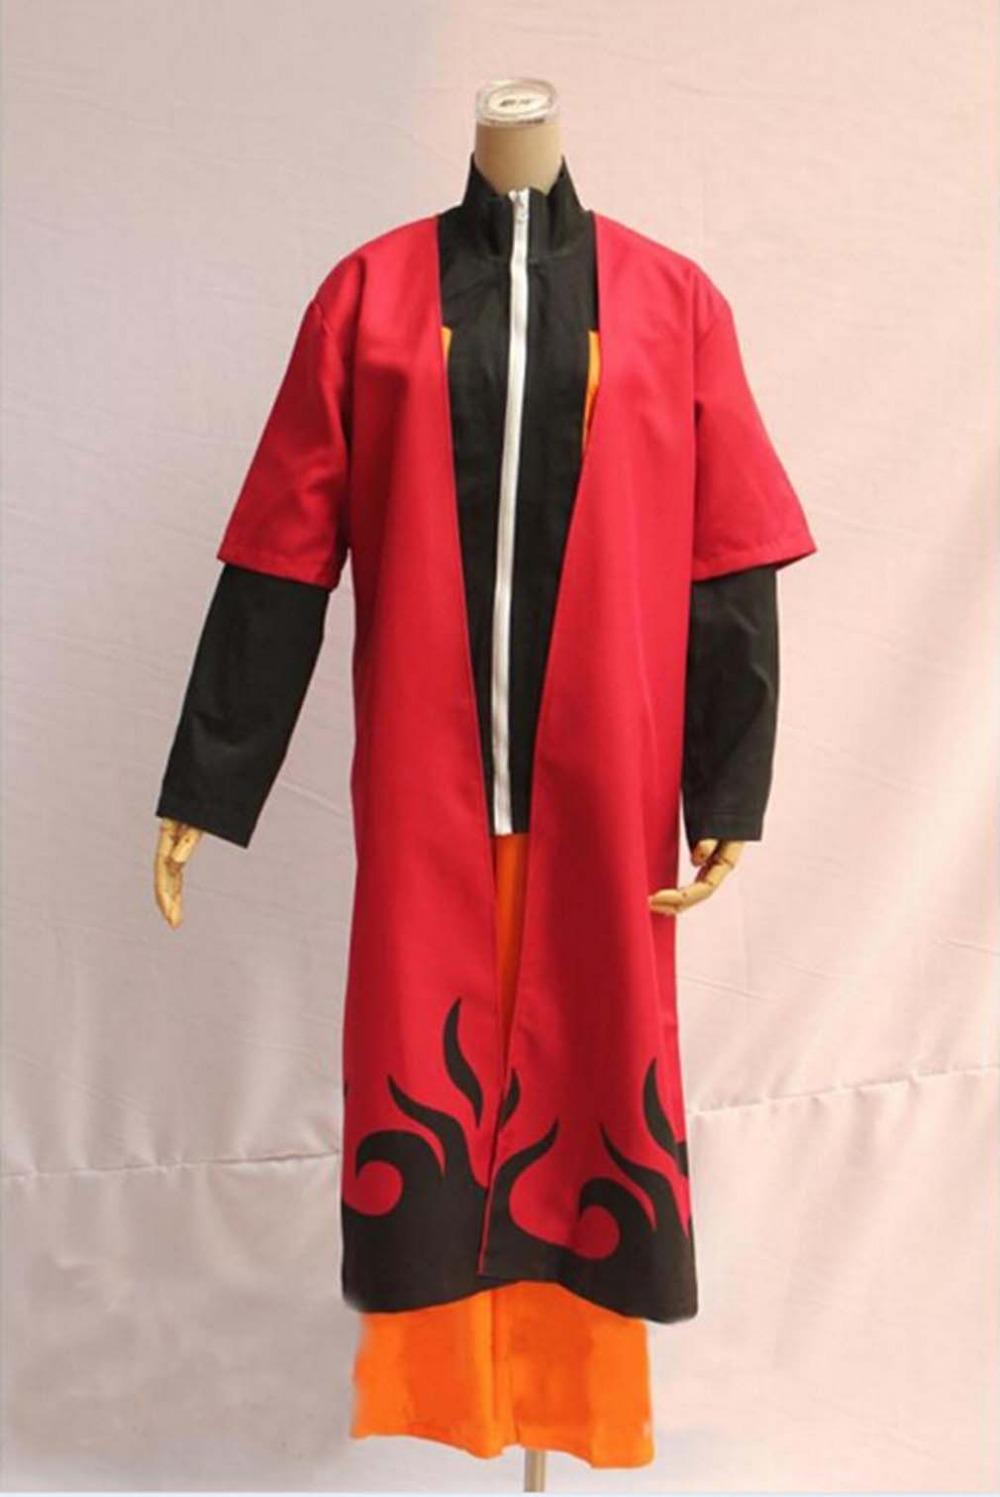 New Fashion Unisex Naruto Cosplay Costumes Japan Anime Uzumaki Naruto Cosplay Robes Cool Man Cool Woman Cosplay Costumes(China (Mainland))